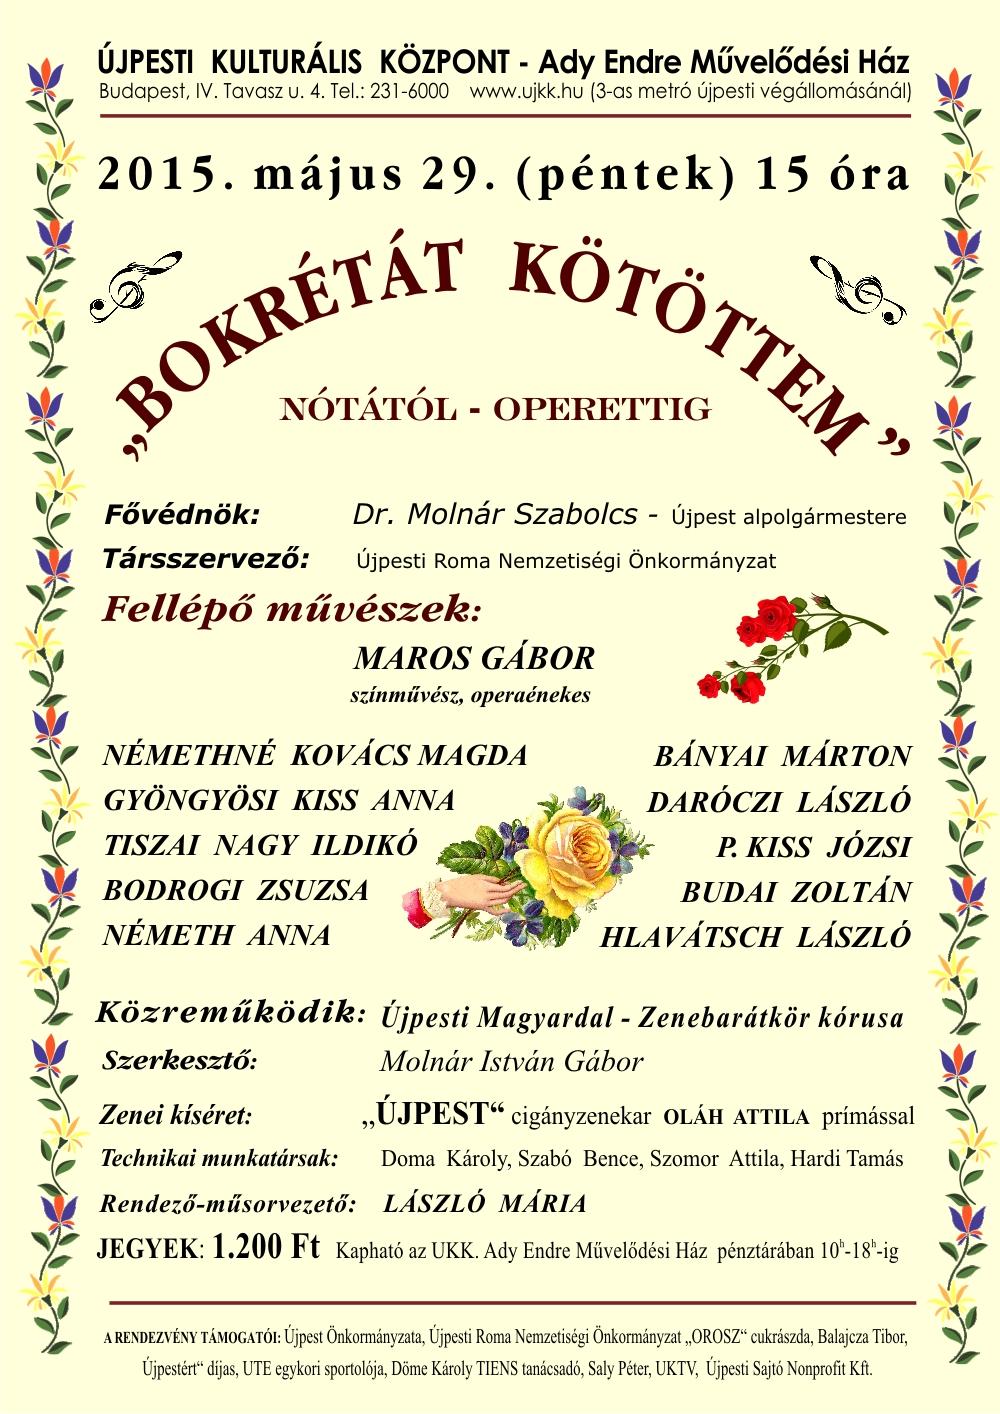 http://pctrs.network.hu/picture/1/4/9/2/_/plakat_2015_majusi__nyarkoszonto__notaest_1492866_1824.jpg